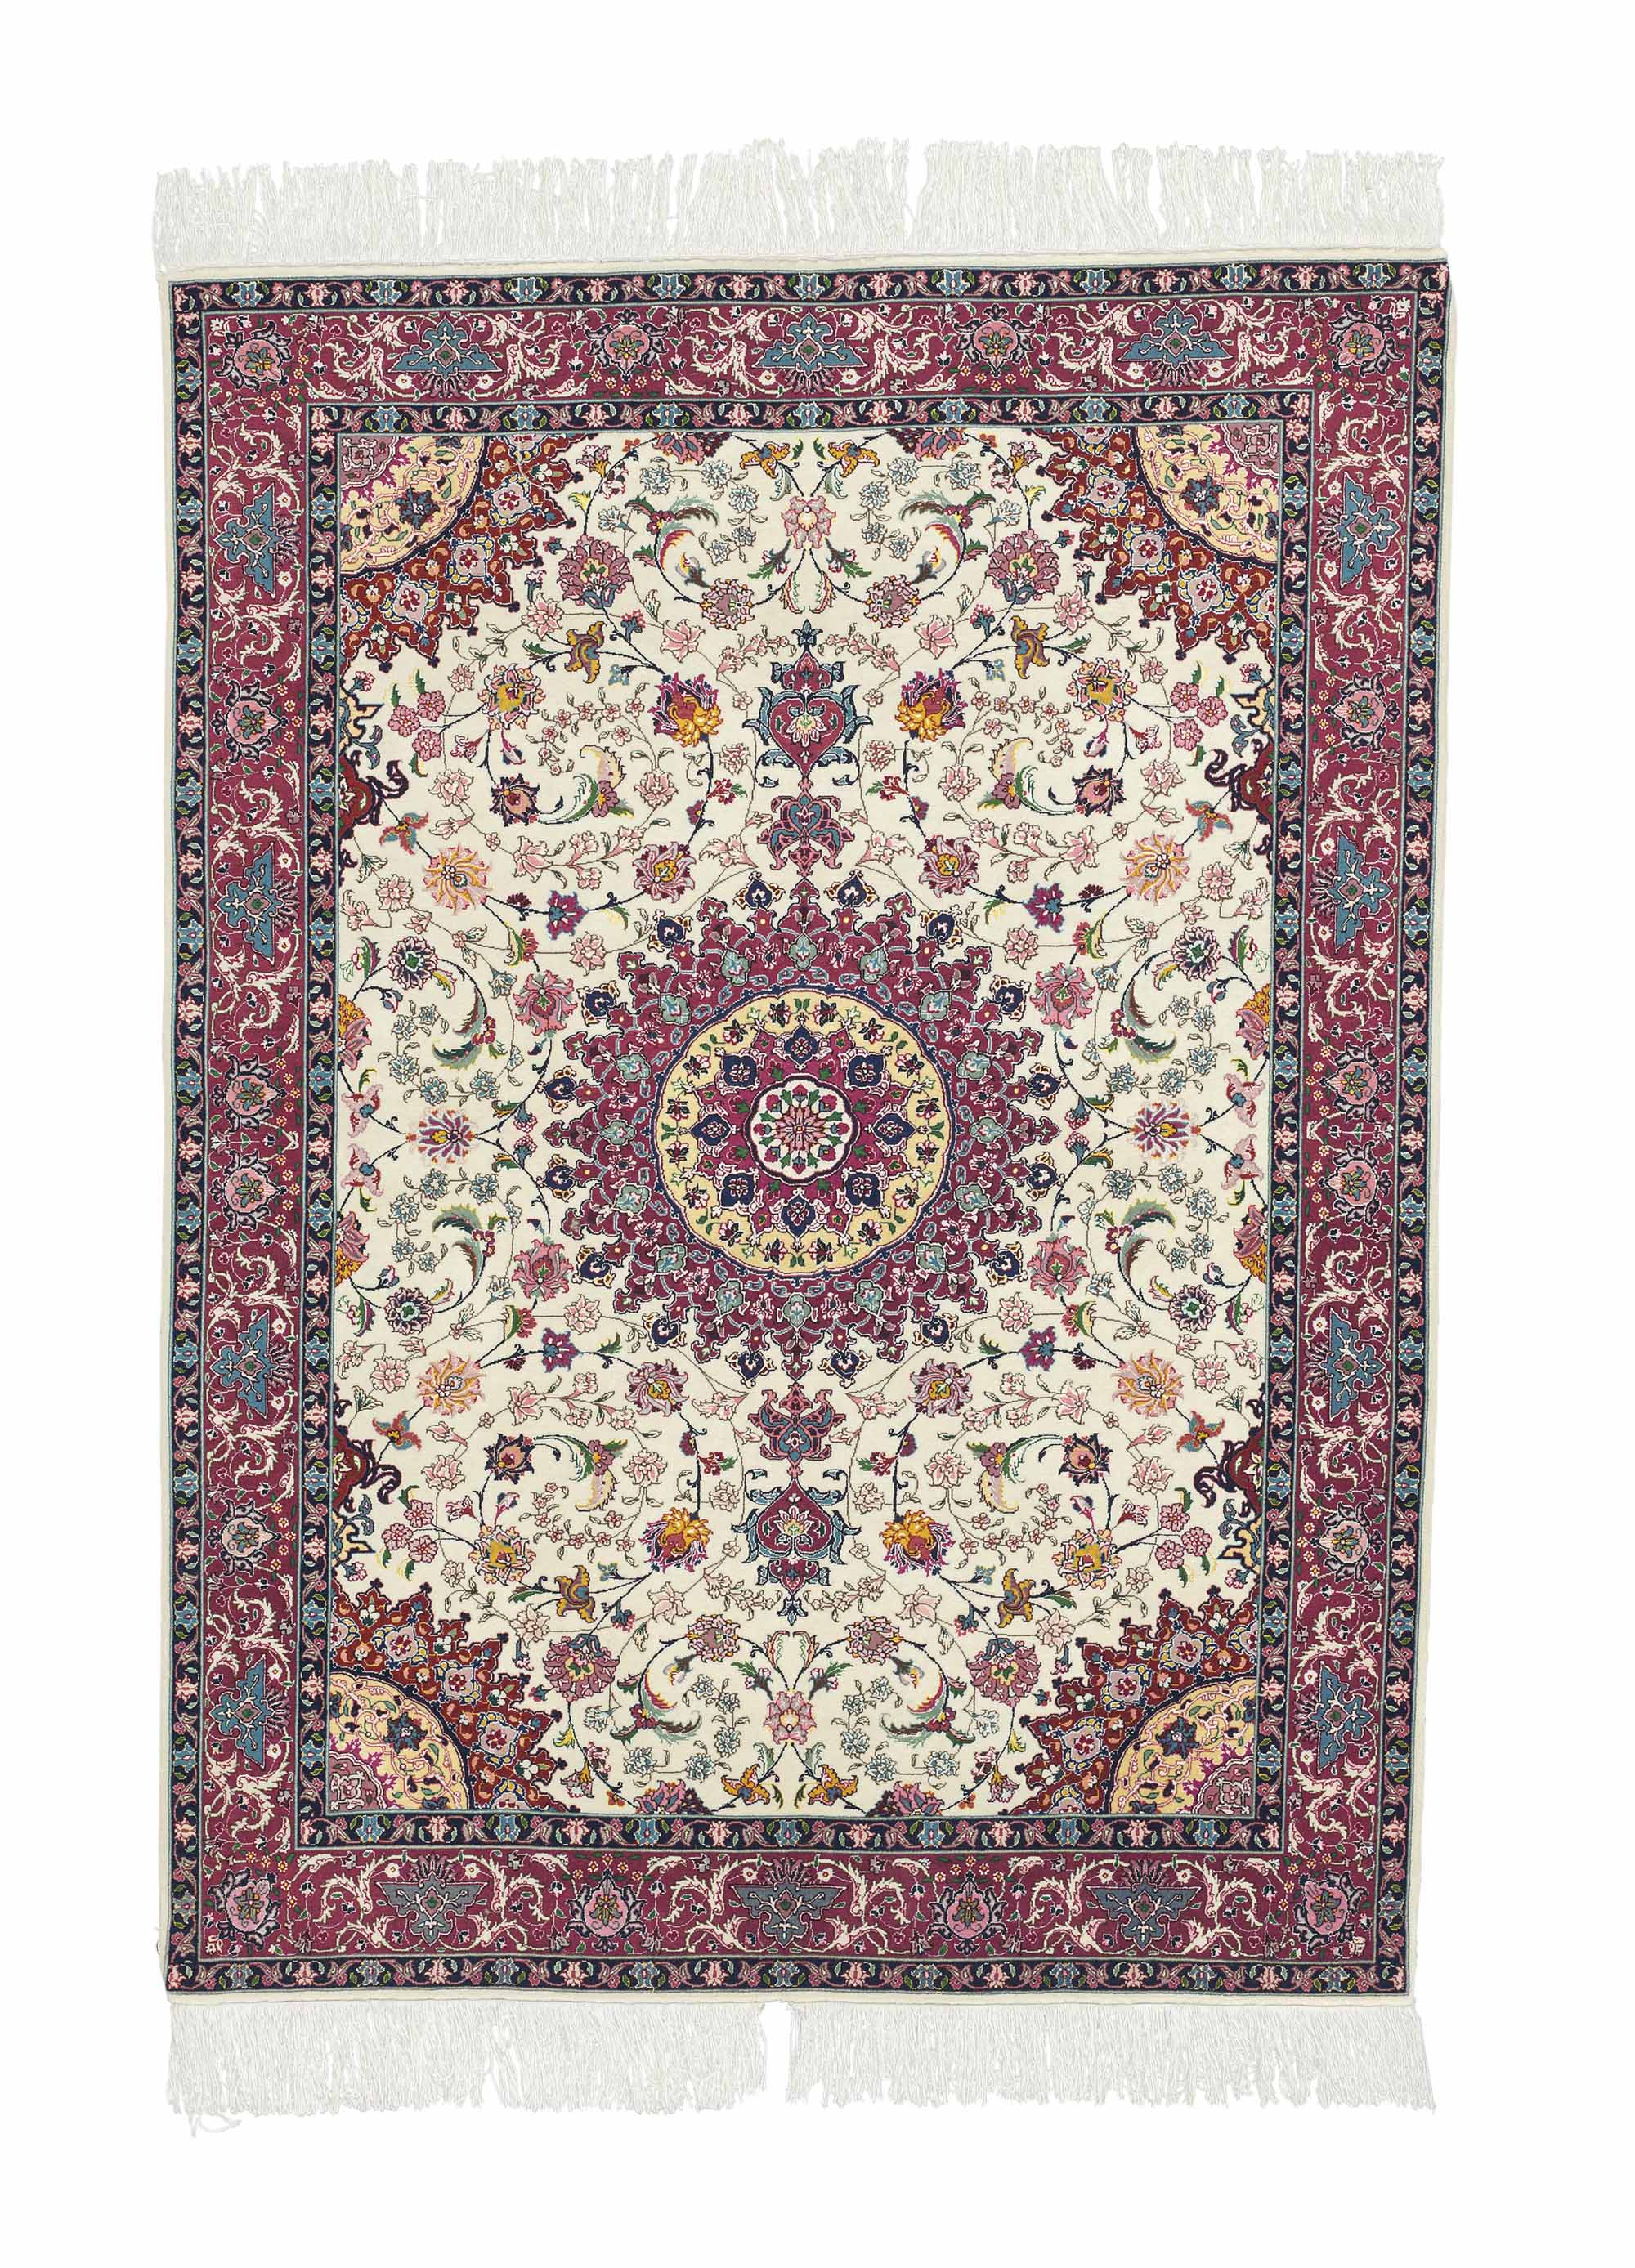 A fine part silk large Tabriz